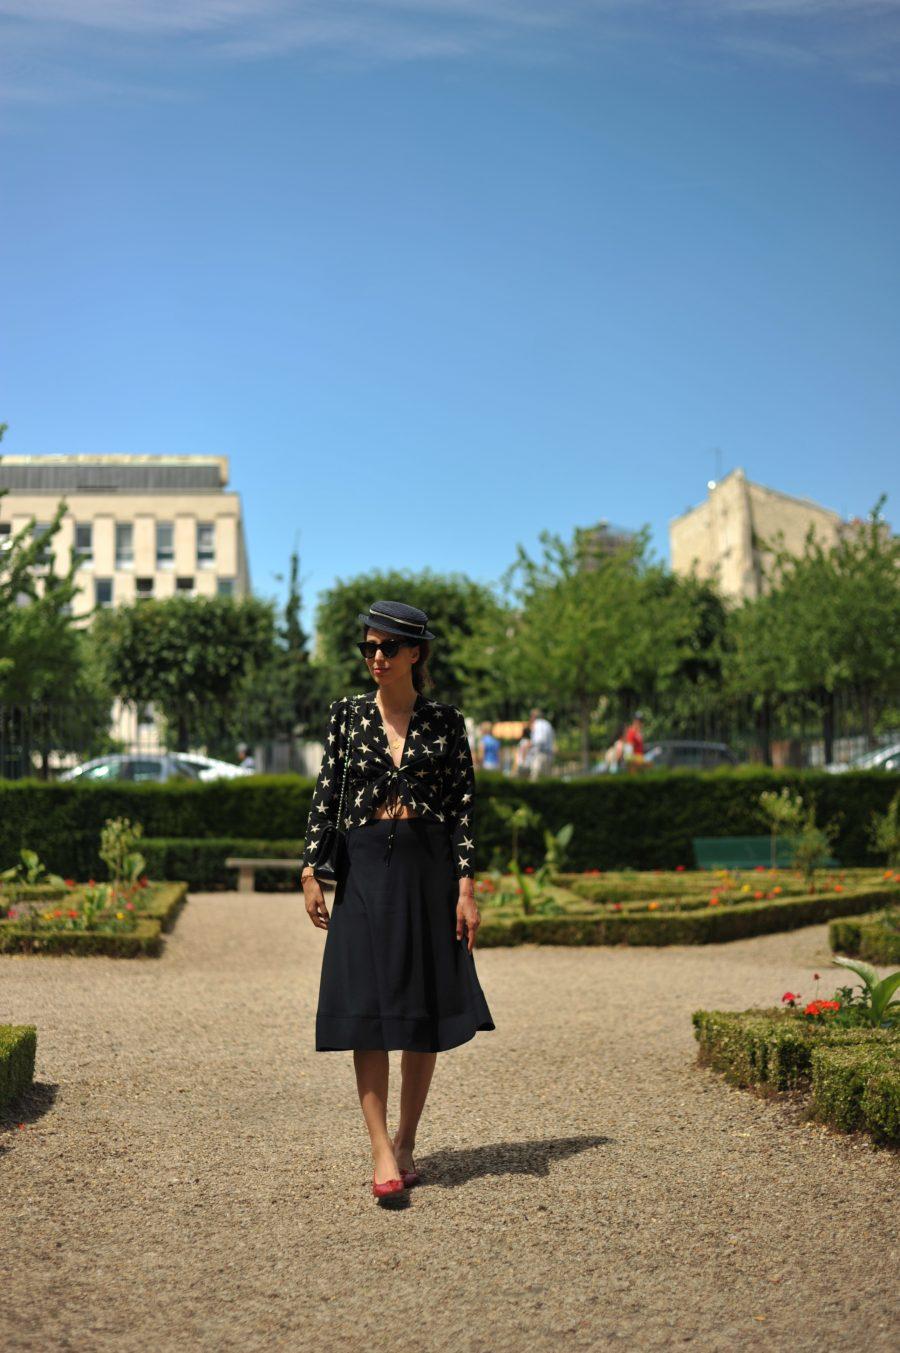 jupe-midi-parisienne-cheminsblancs-12